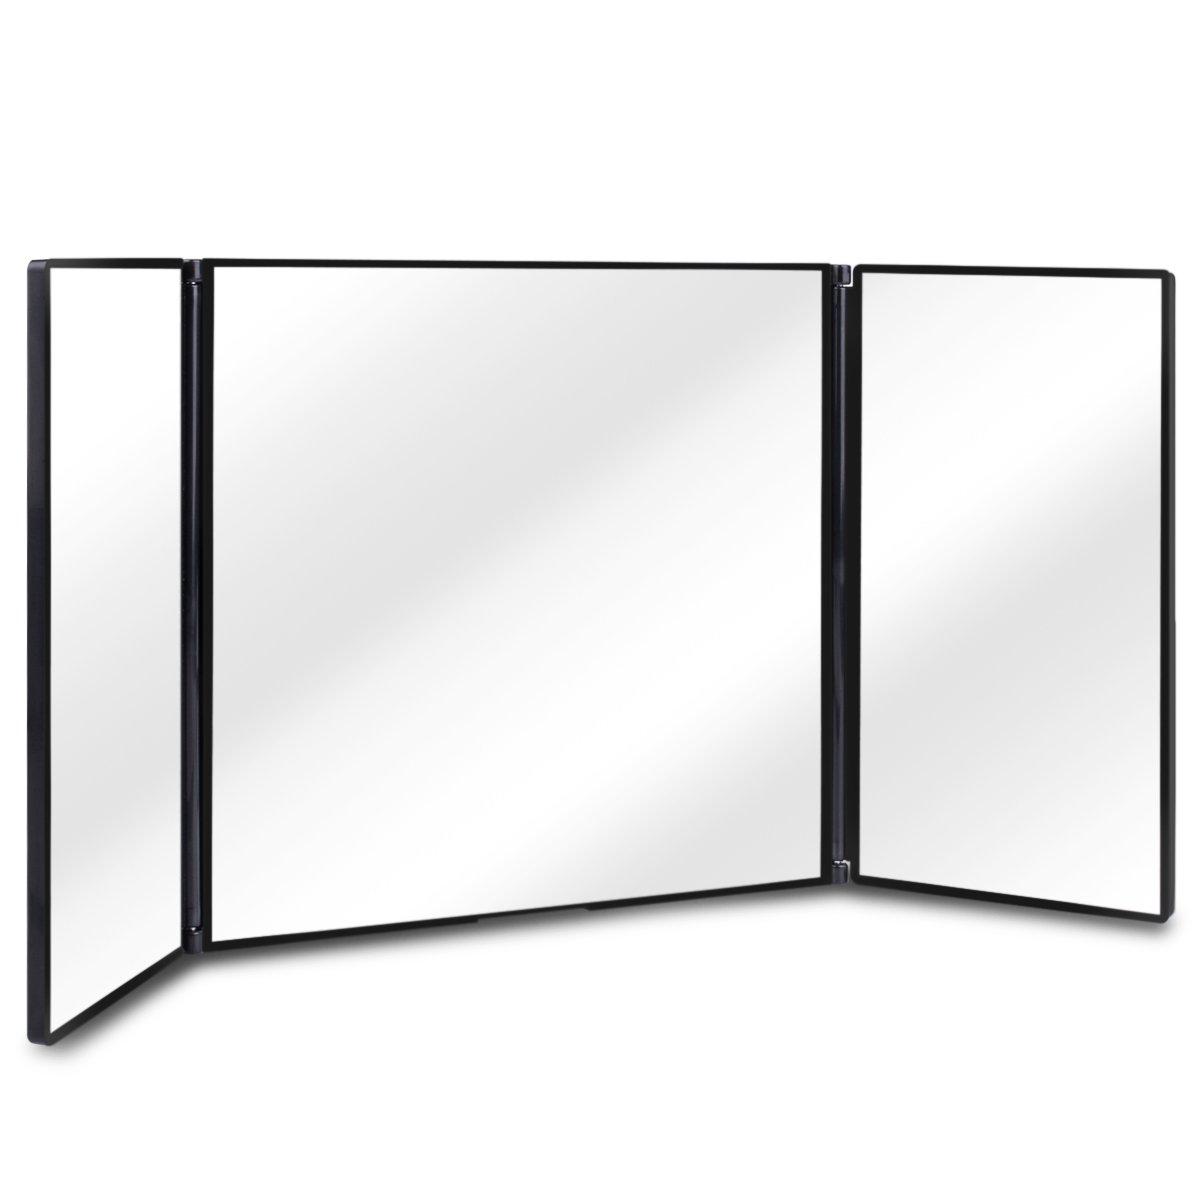 "Sun Visor Vanity Mirror,Huicocy Car Sun Visor Mirror Makeup Vanity Mirror Car Cosmetic Mirror Clip On Sun Visor Auto Supplies 310mm 12"" Universal for Car Truck SUV (12in5.5in, black)"